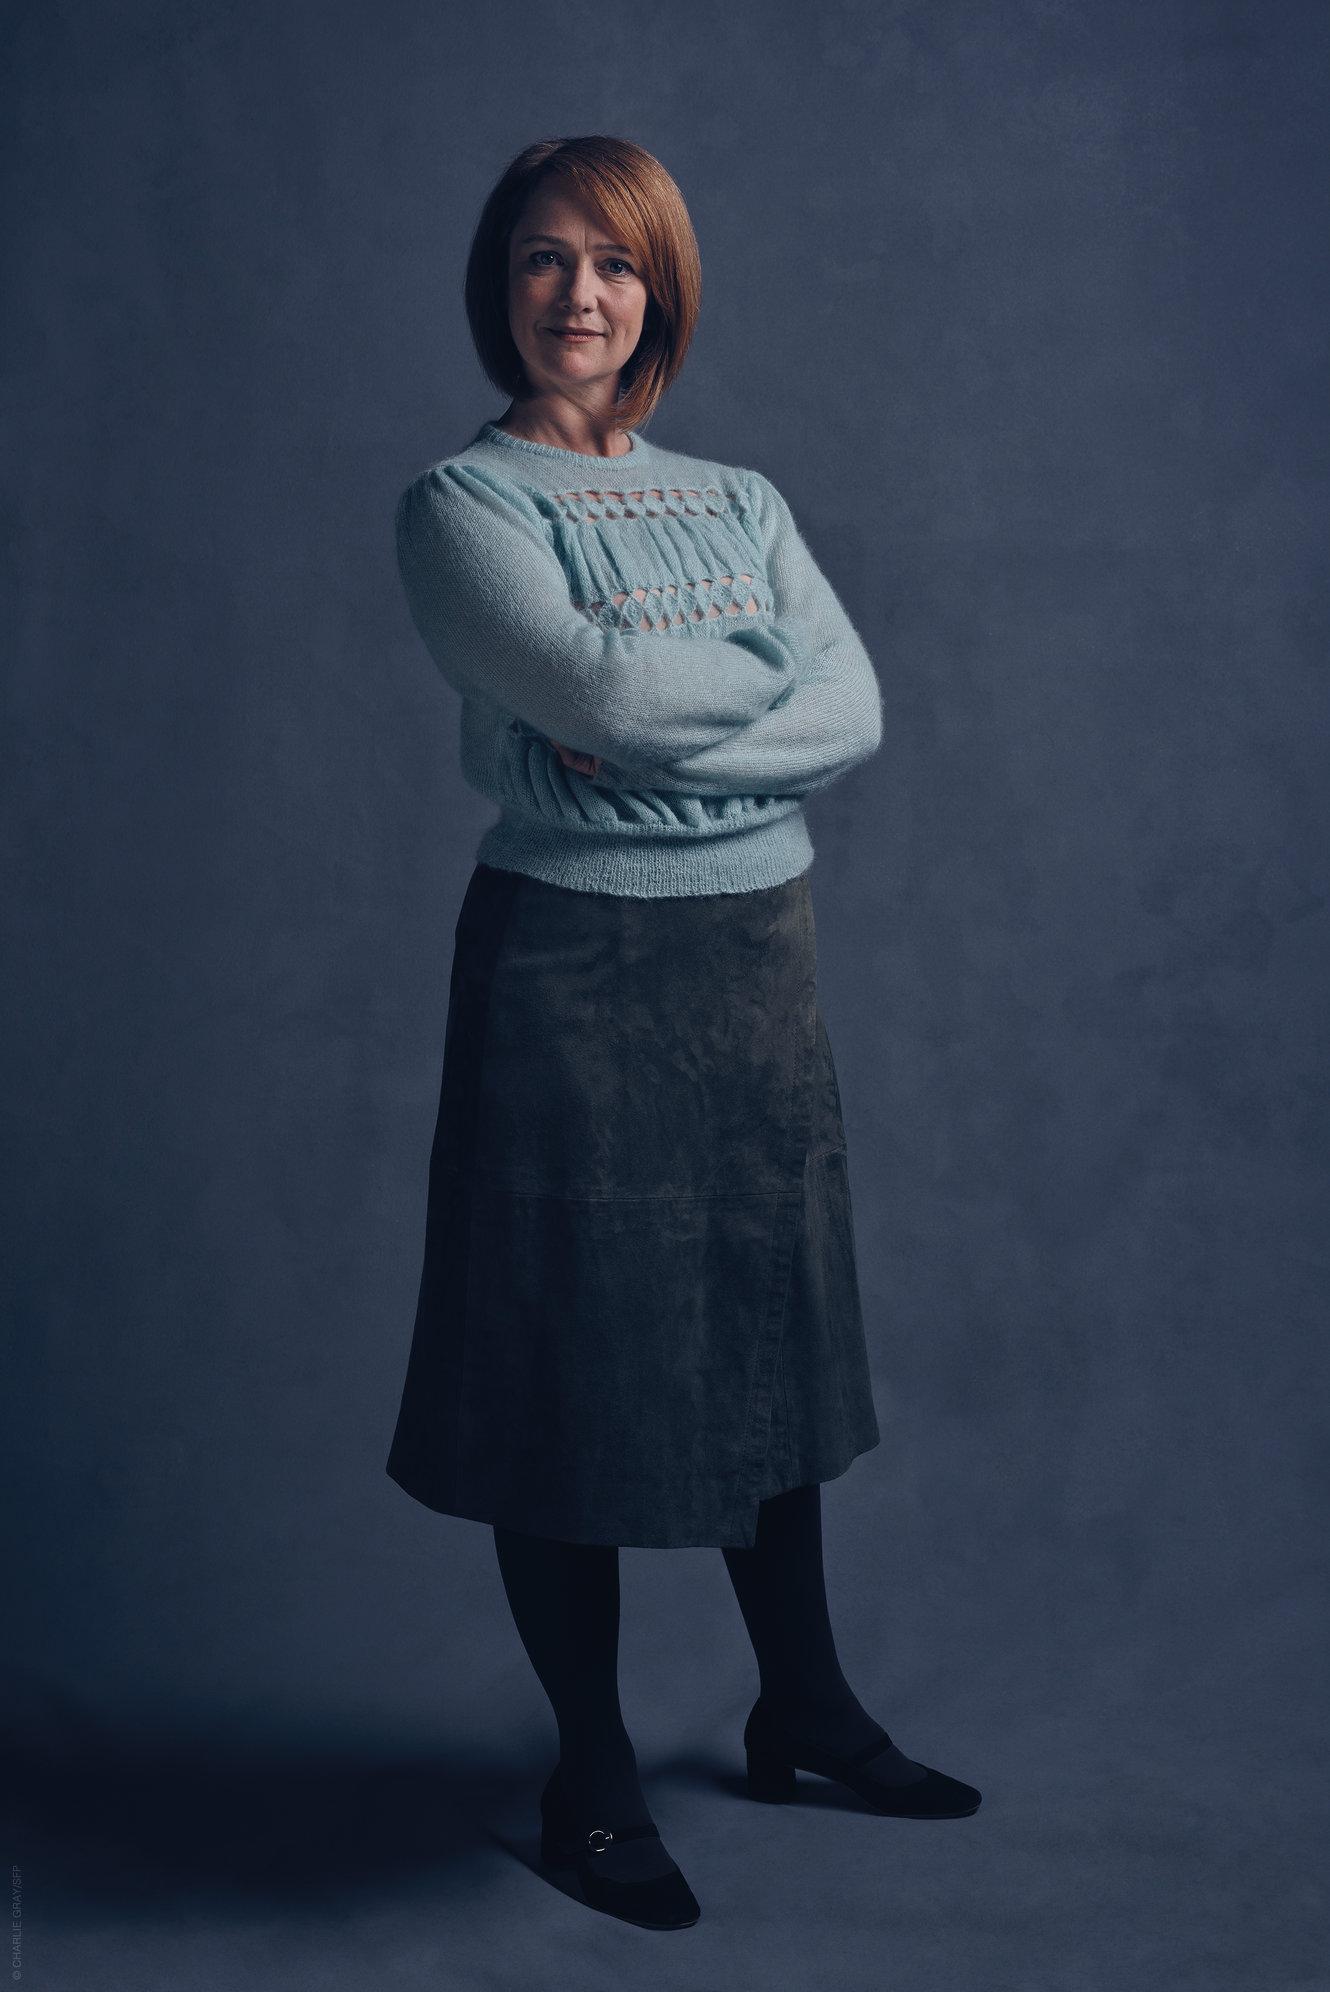 HPCC-Ginny Potter